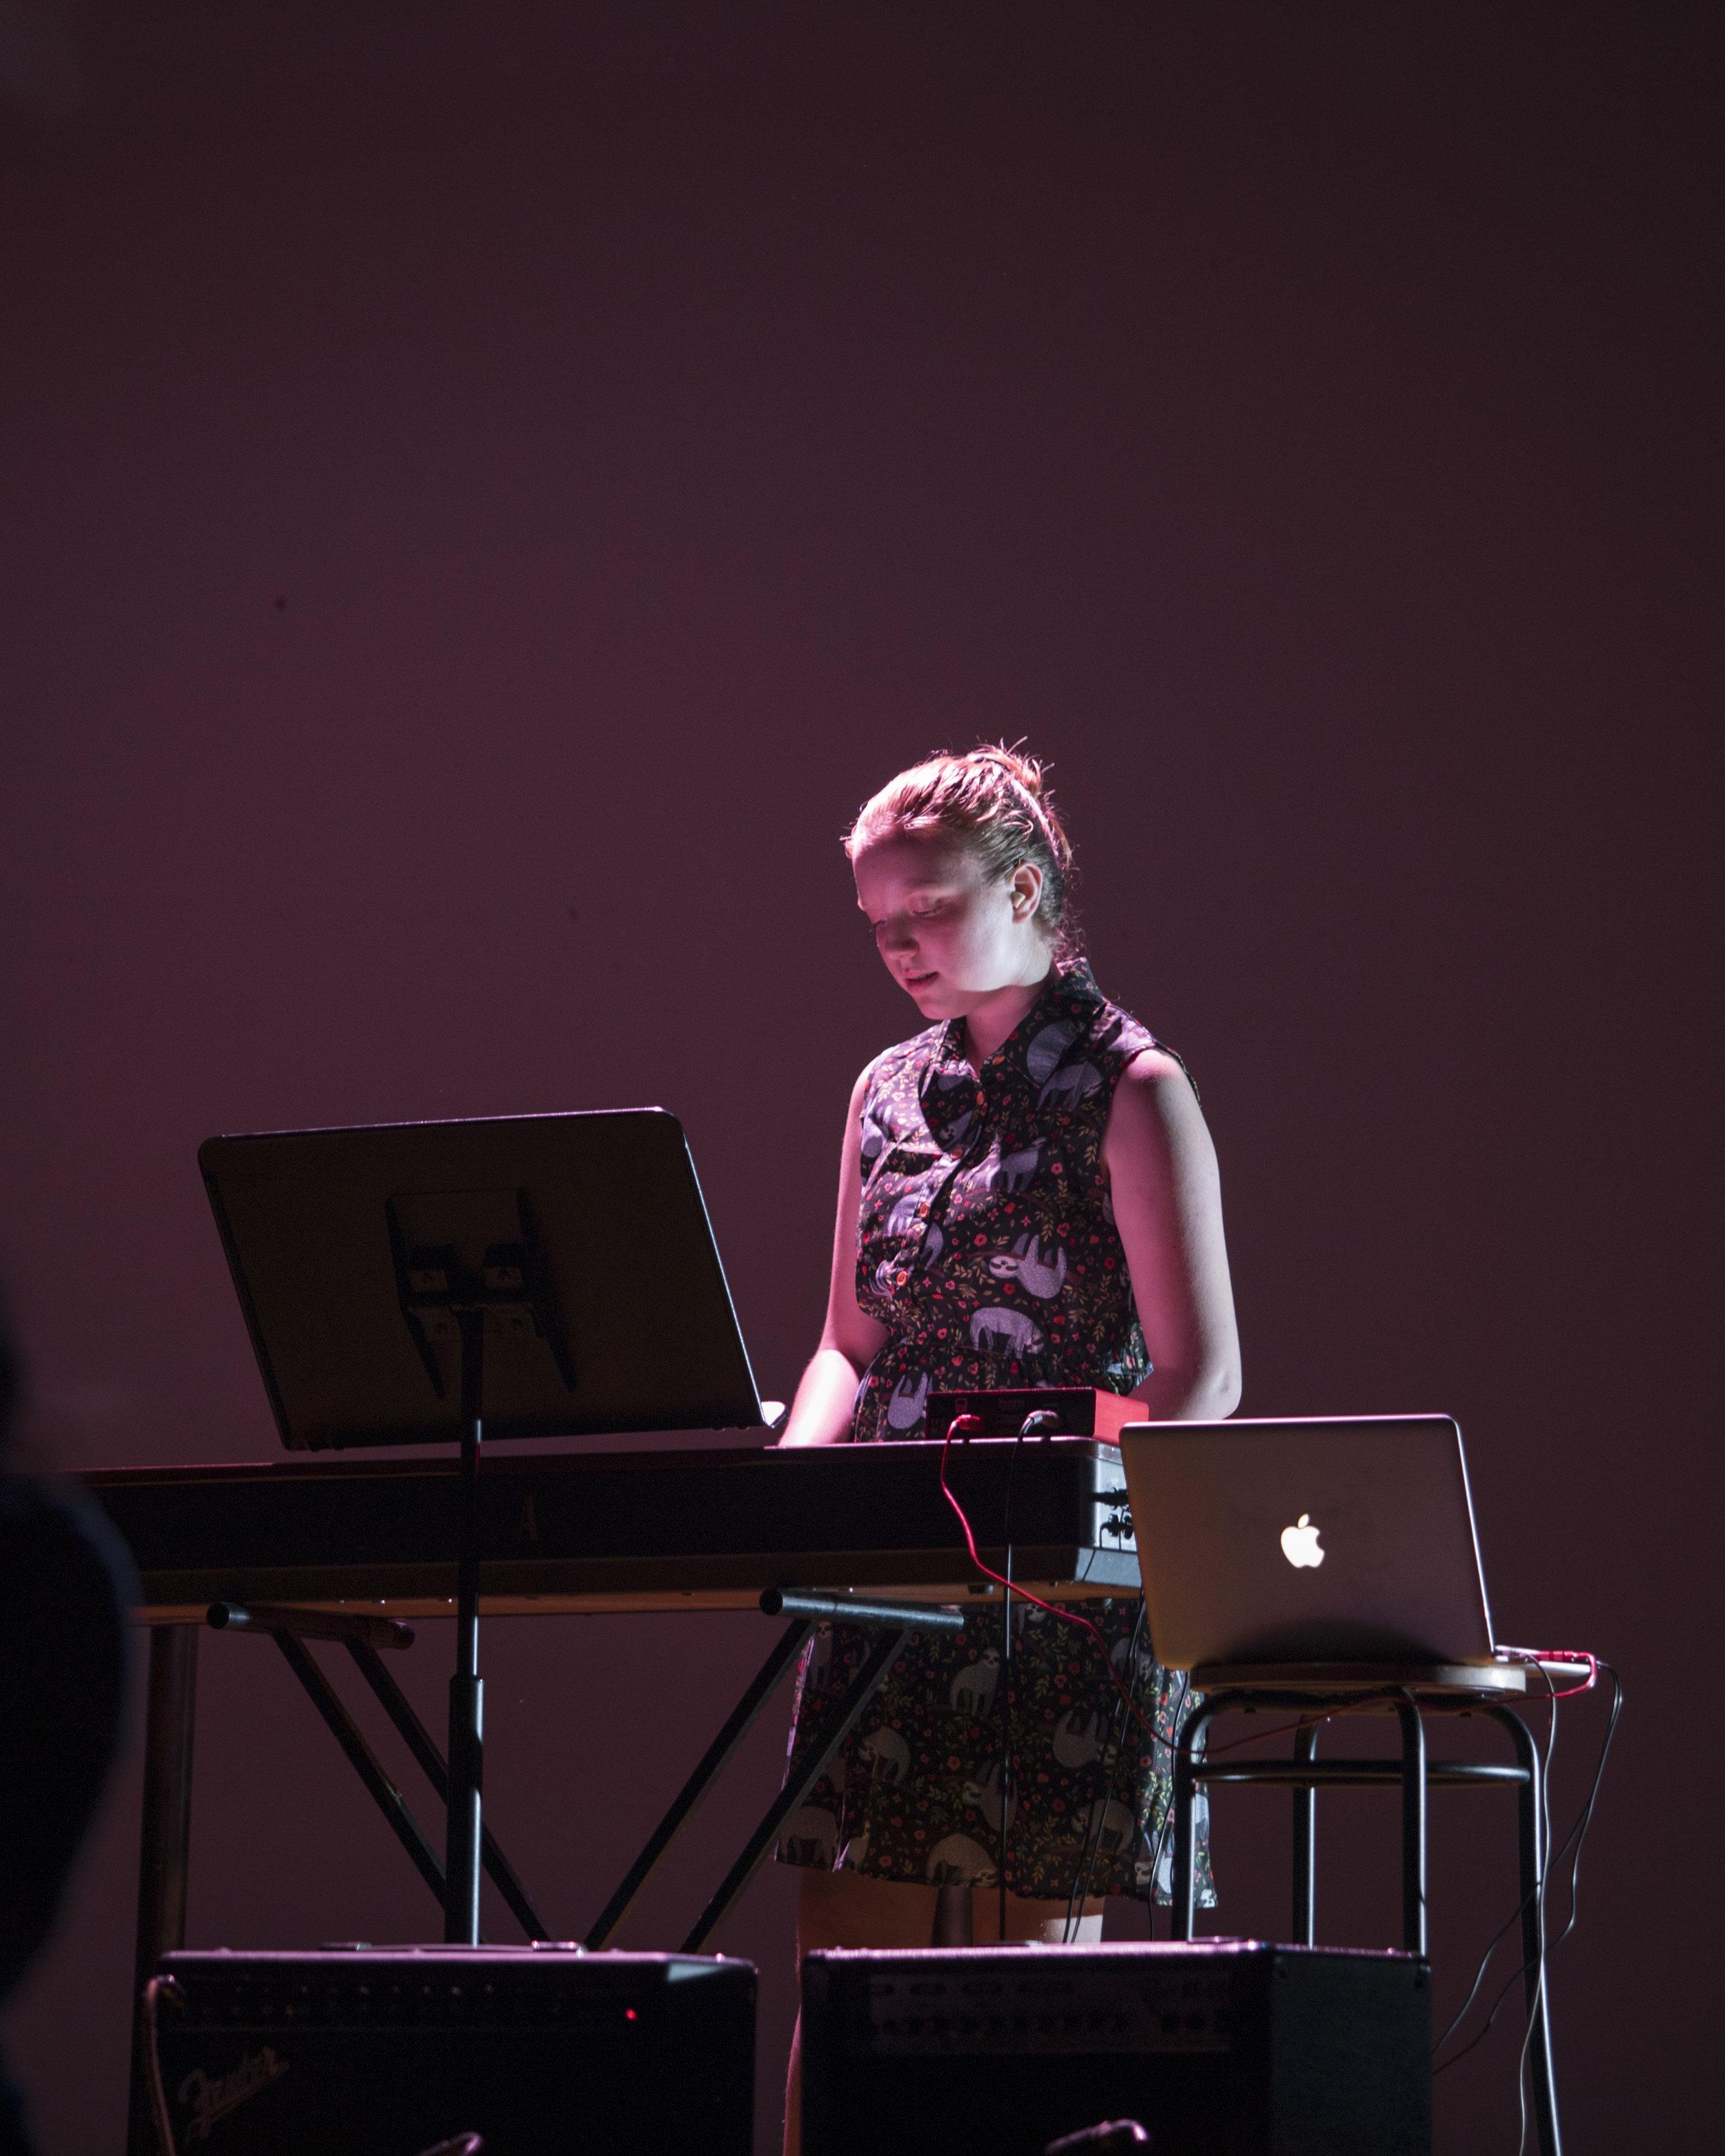 Tribute Show by Jehanne-Marie Milne-30.jpg